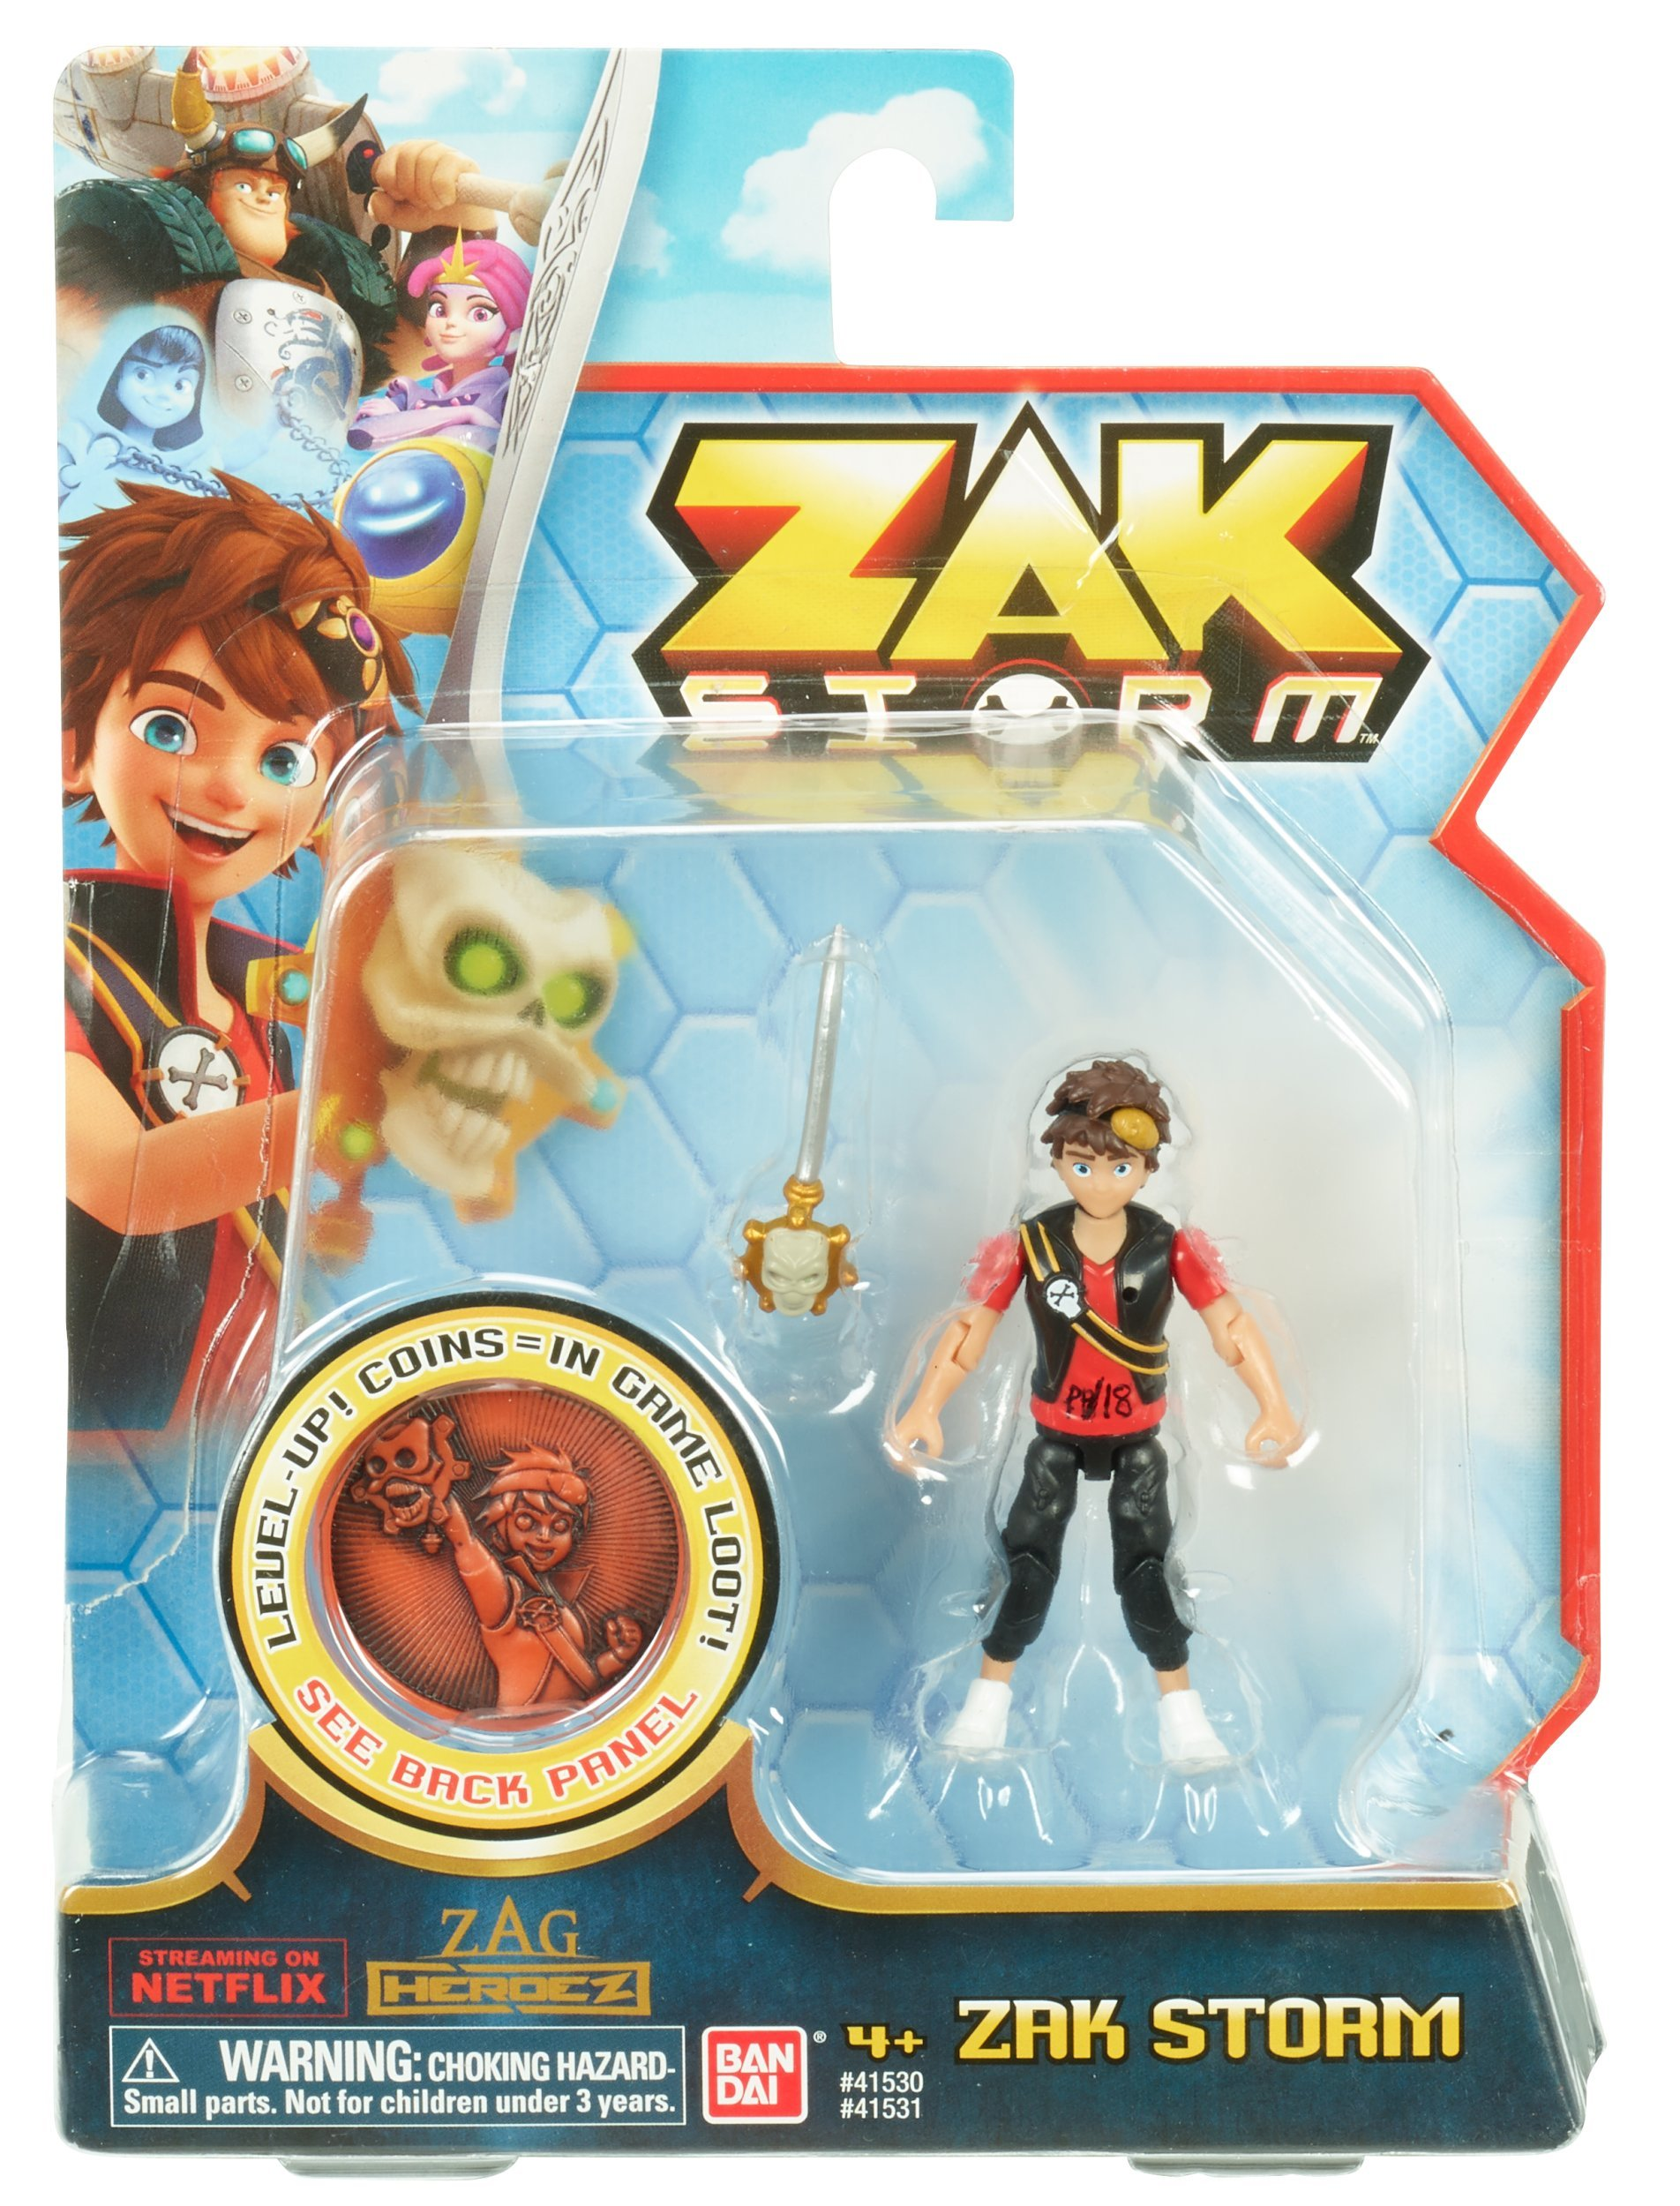 Zak Storm Zak 3-inch Scale Action Figure with Blind Bag Zak Storm